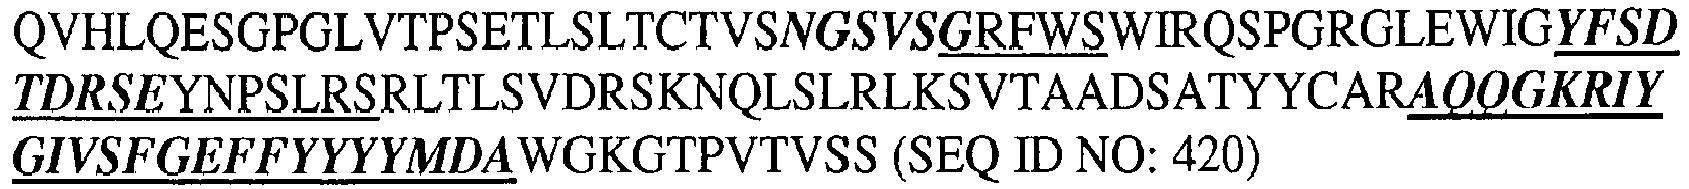 Figure imgb0311